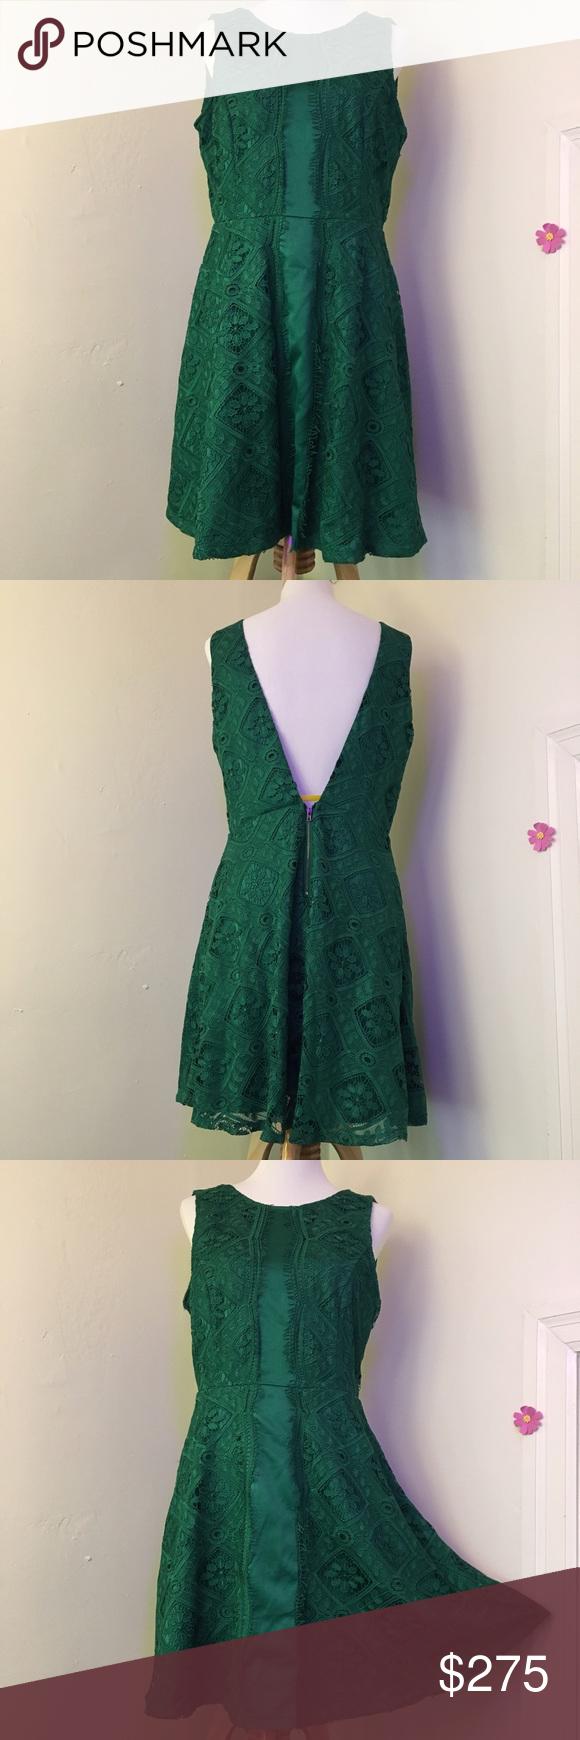 Hp lace vback dress emerald green adelyn rae dress